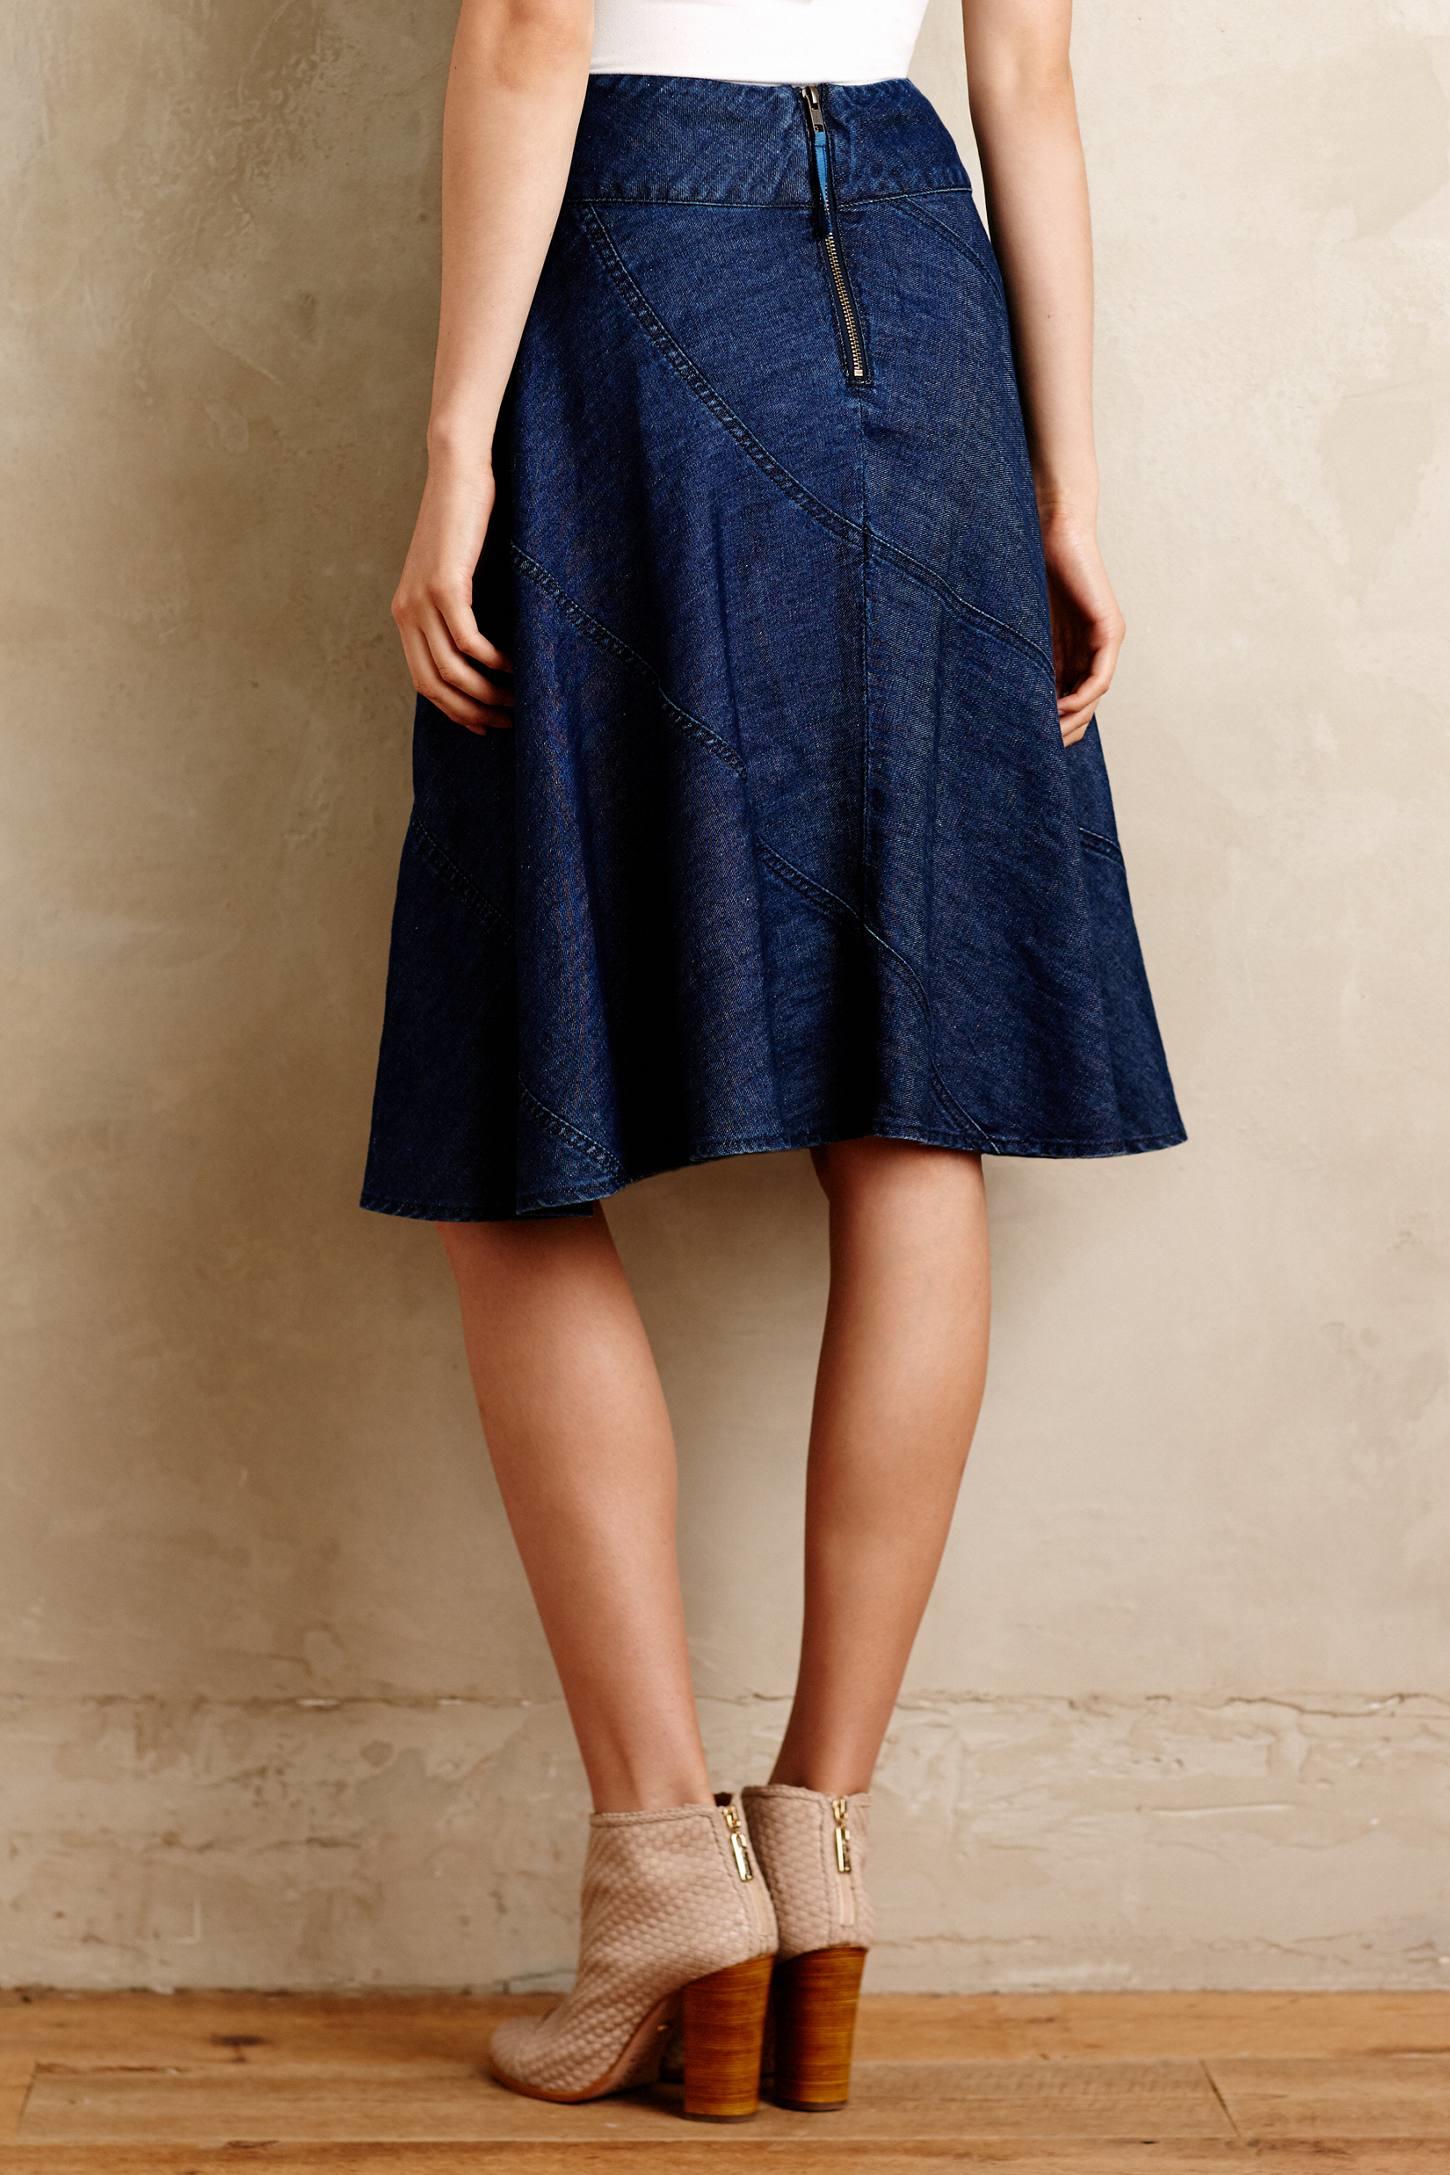 Jean Circle Skirt - Dress Ala